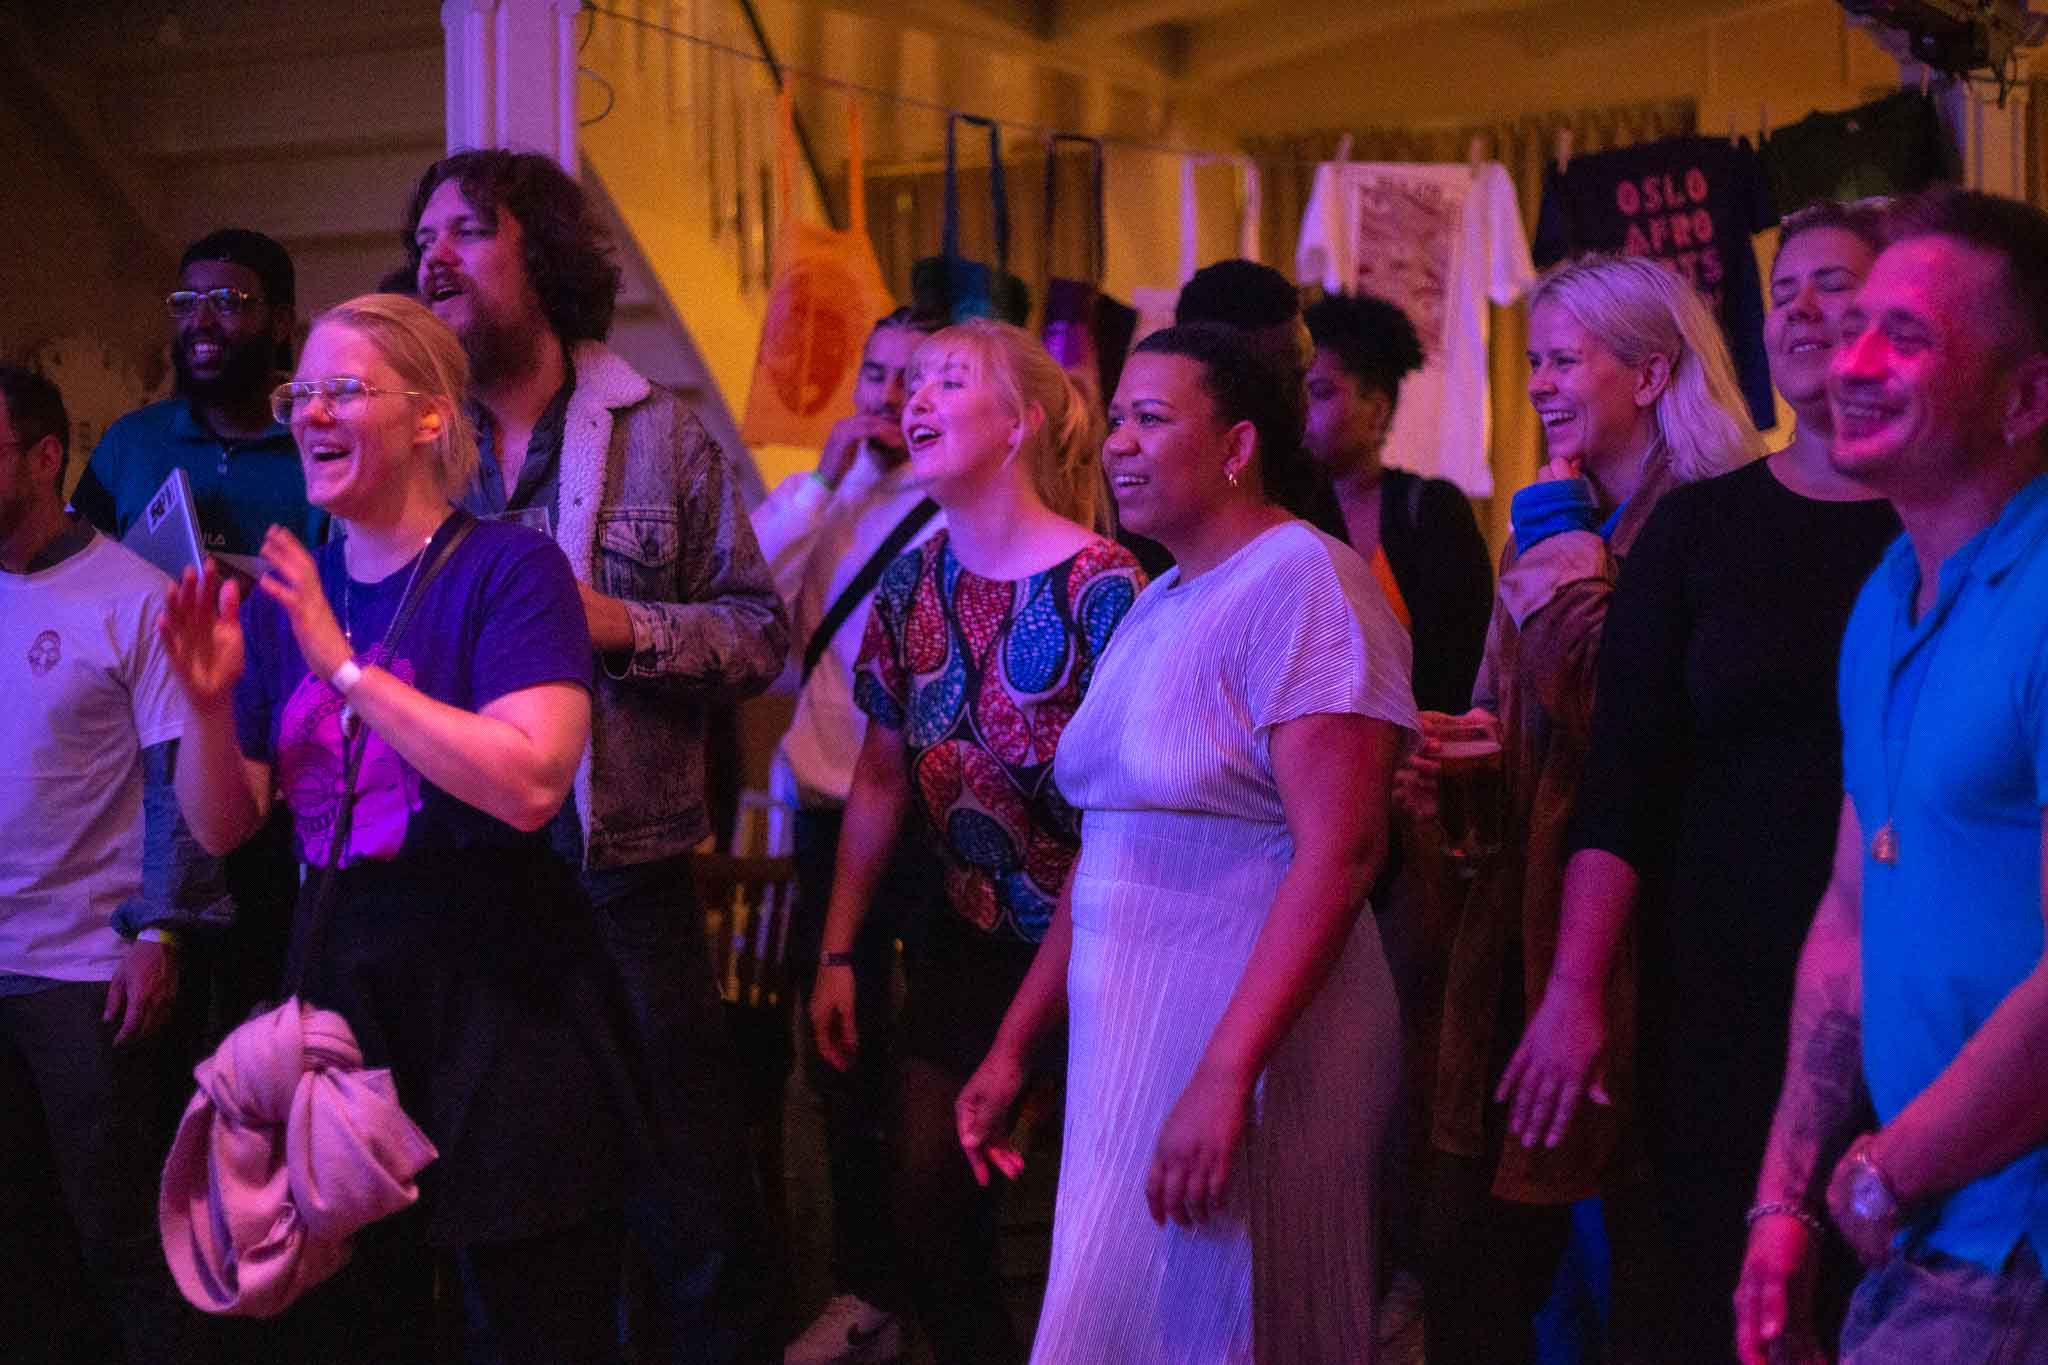 Oslo Afro Arts visitors 2019